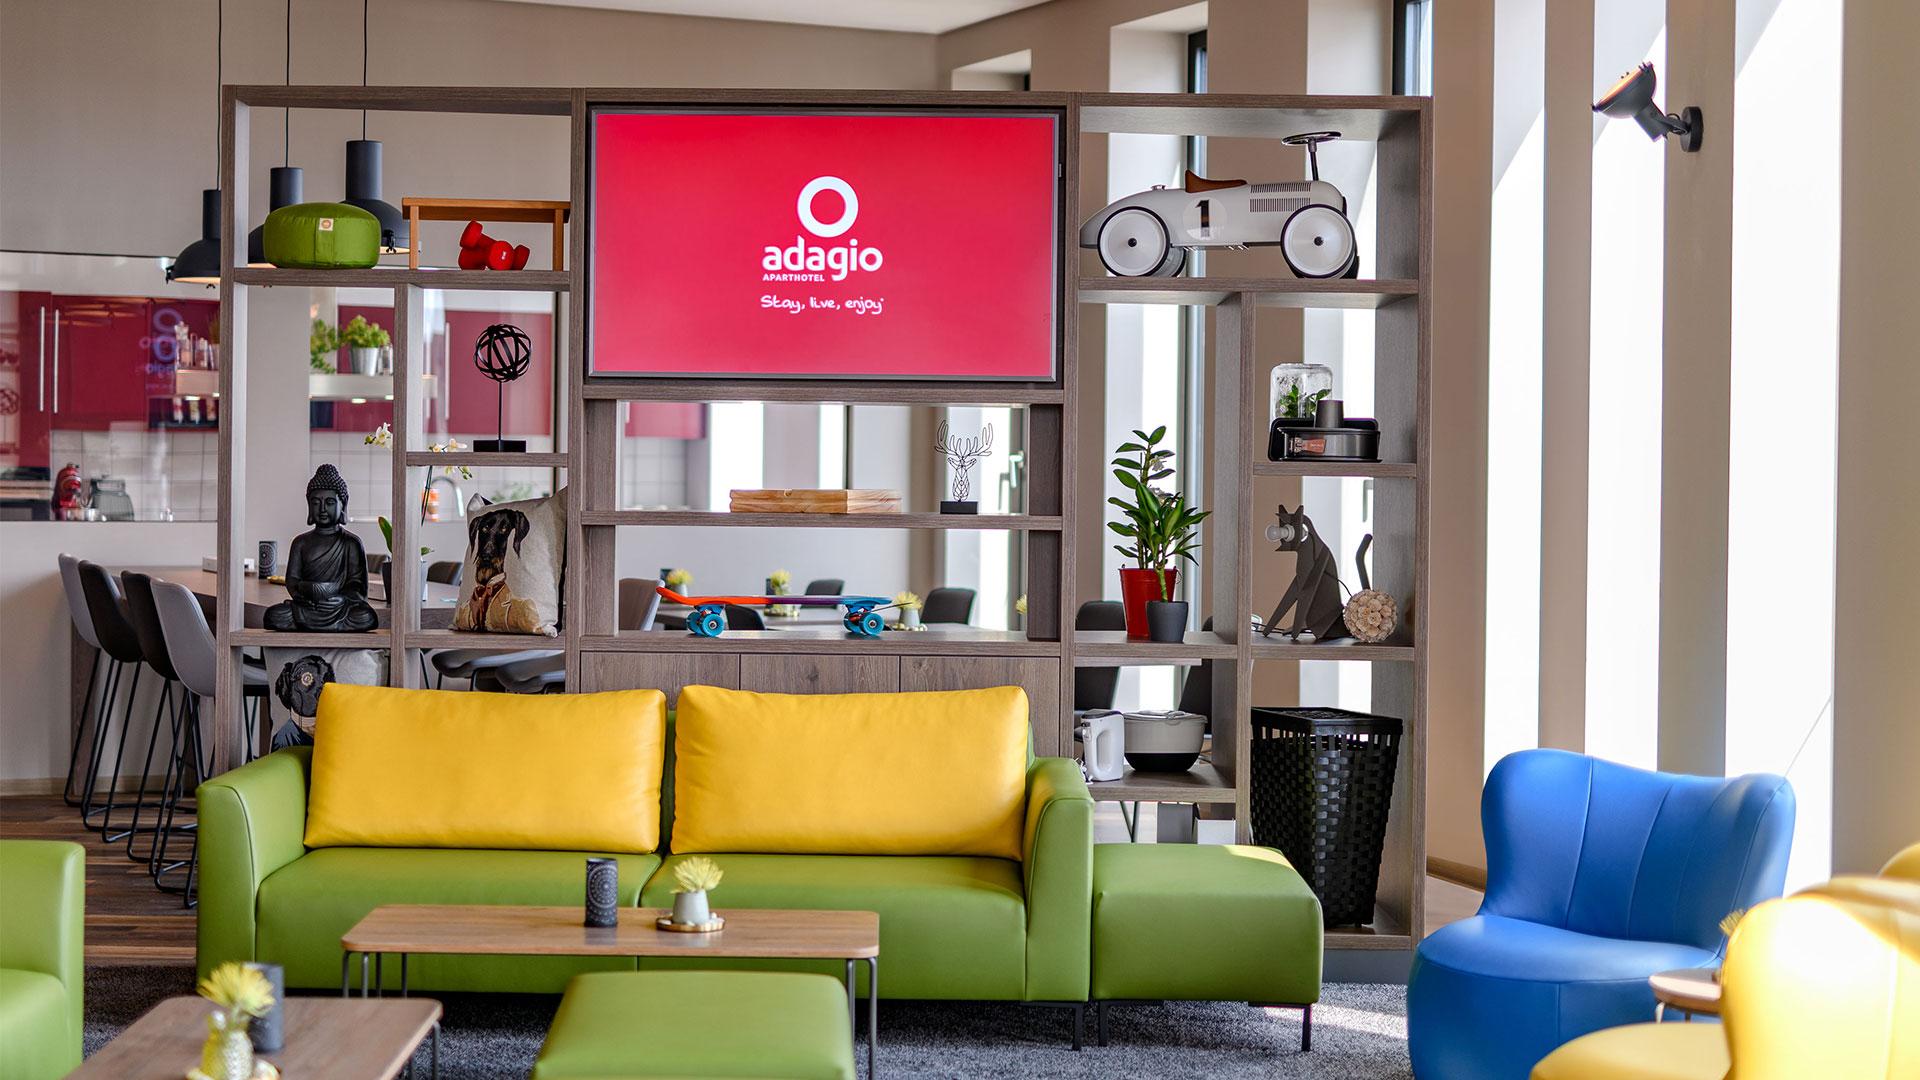 Foto der Lounge - 01 - Aparthotel Adagio Bremen